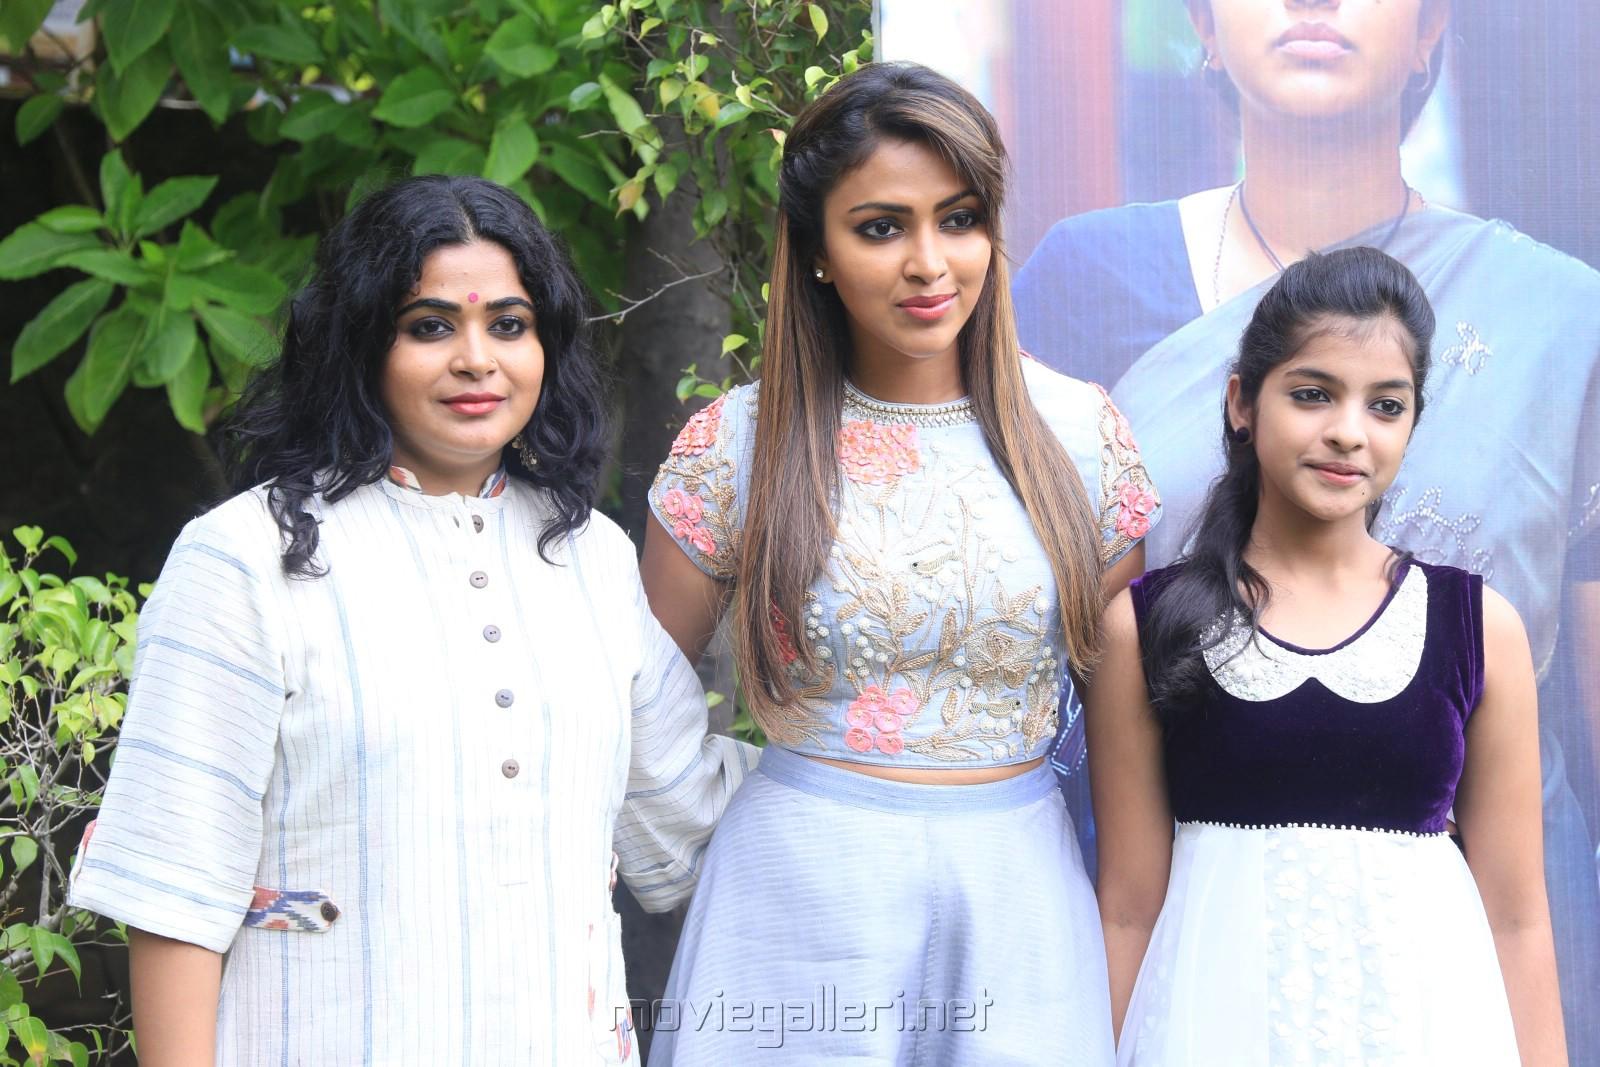 Ashwini Tiwari Iyer, Amala Paul @ Amma Kanakku Movie Press Meet Stills